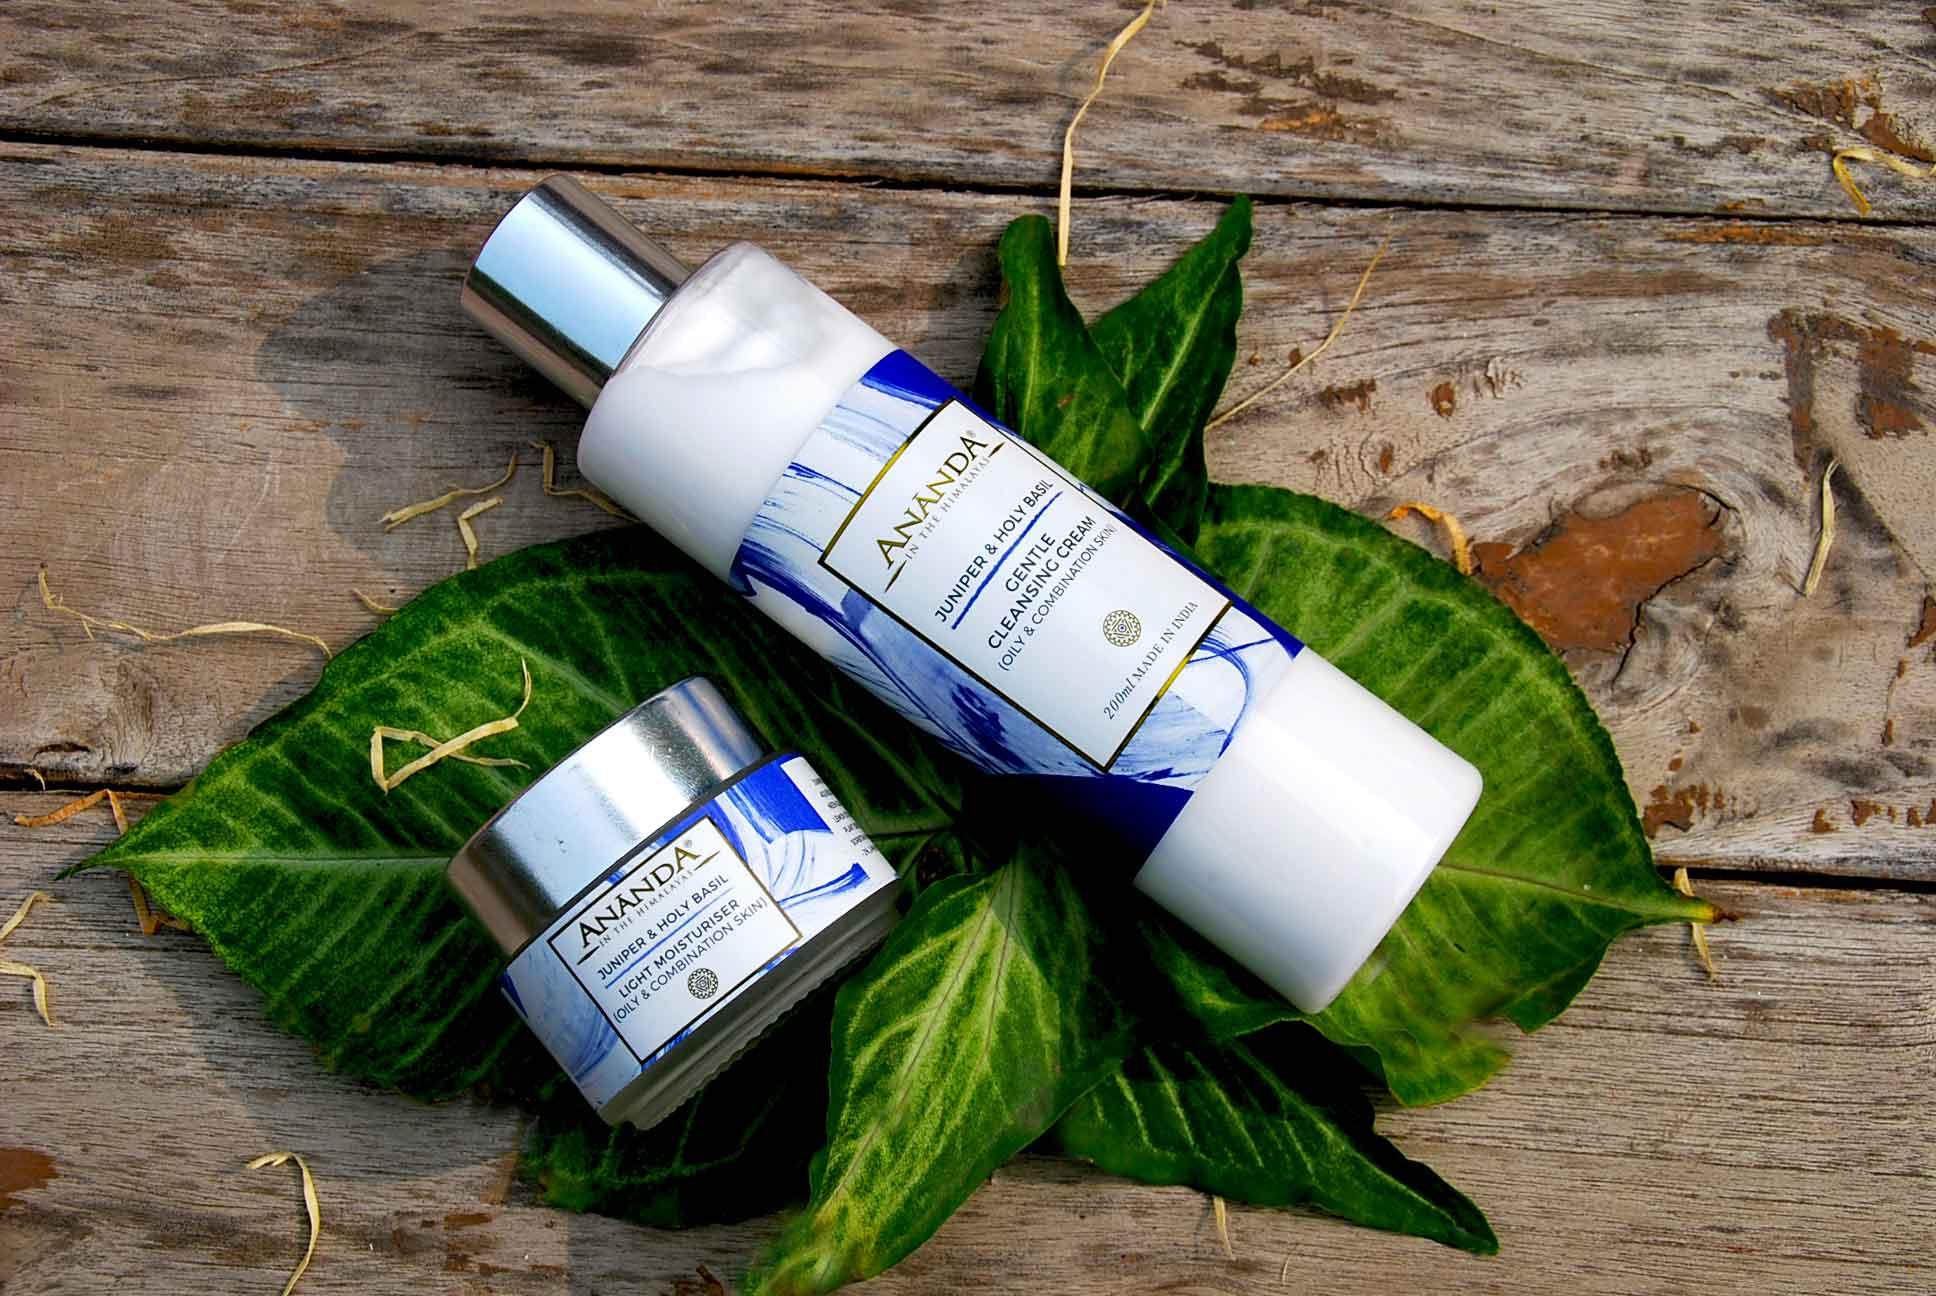 Ananda's Light Moisturiser For Oily Combination Skin, Ananda Spa, Bridal Beauty Routine